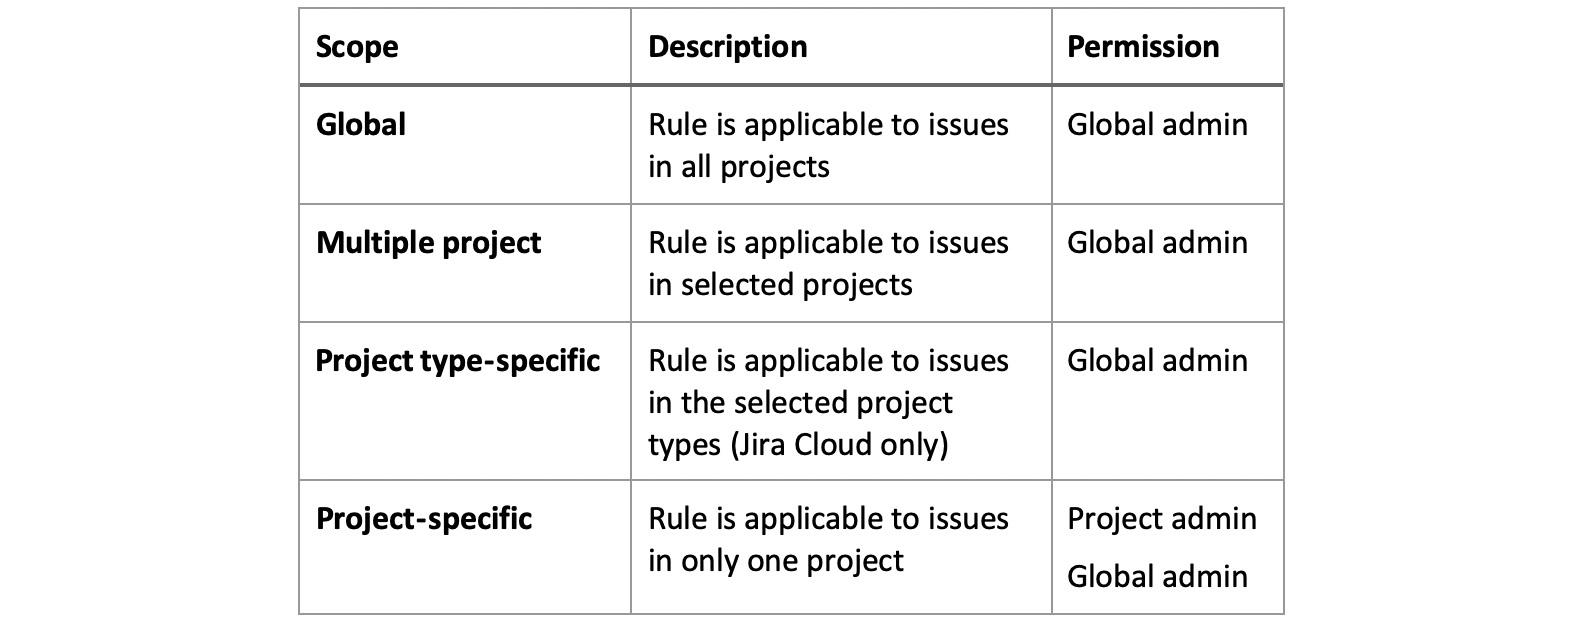 Figure 1.2 – Rule scope permissions